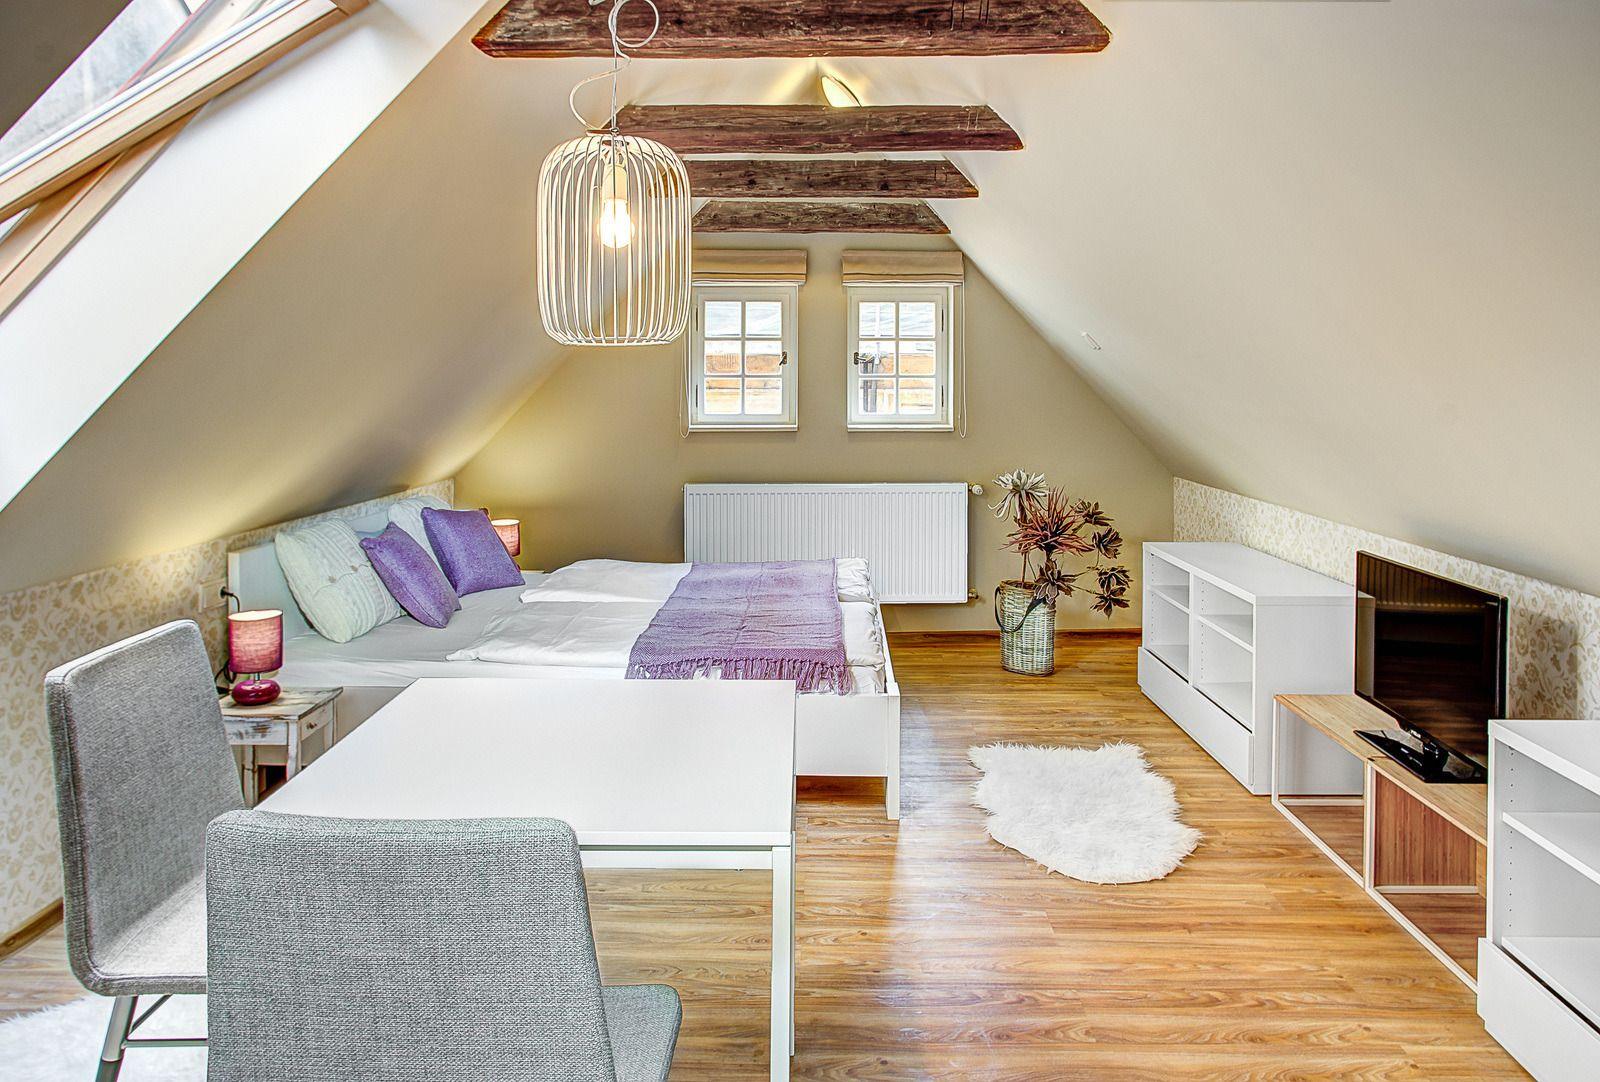 abc suites dachgeschoss studio loft studio prague. Black Bedroom Furniture Sets. Home Design Ideas